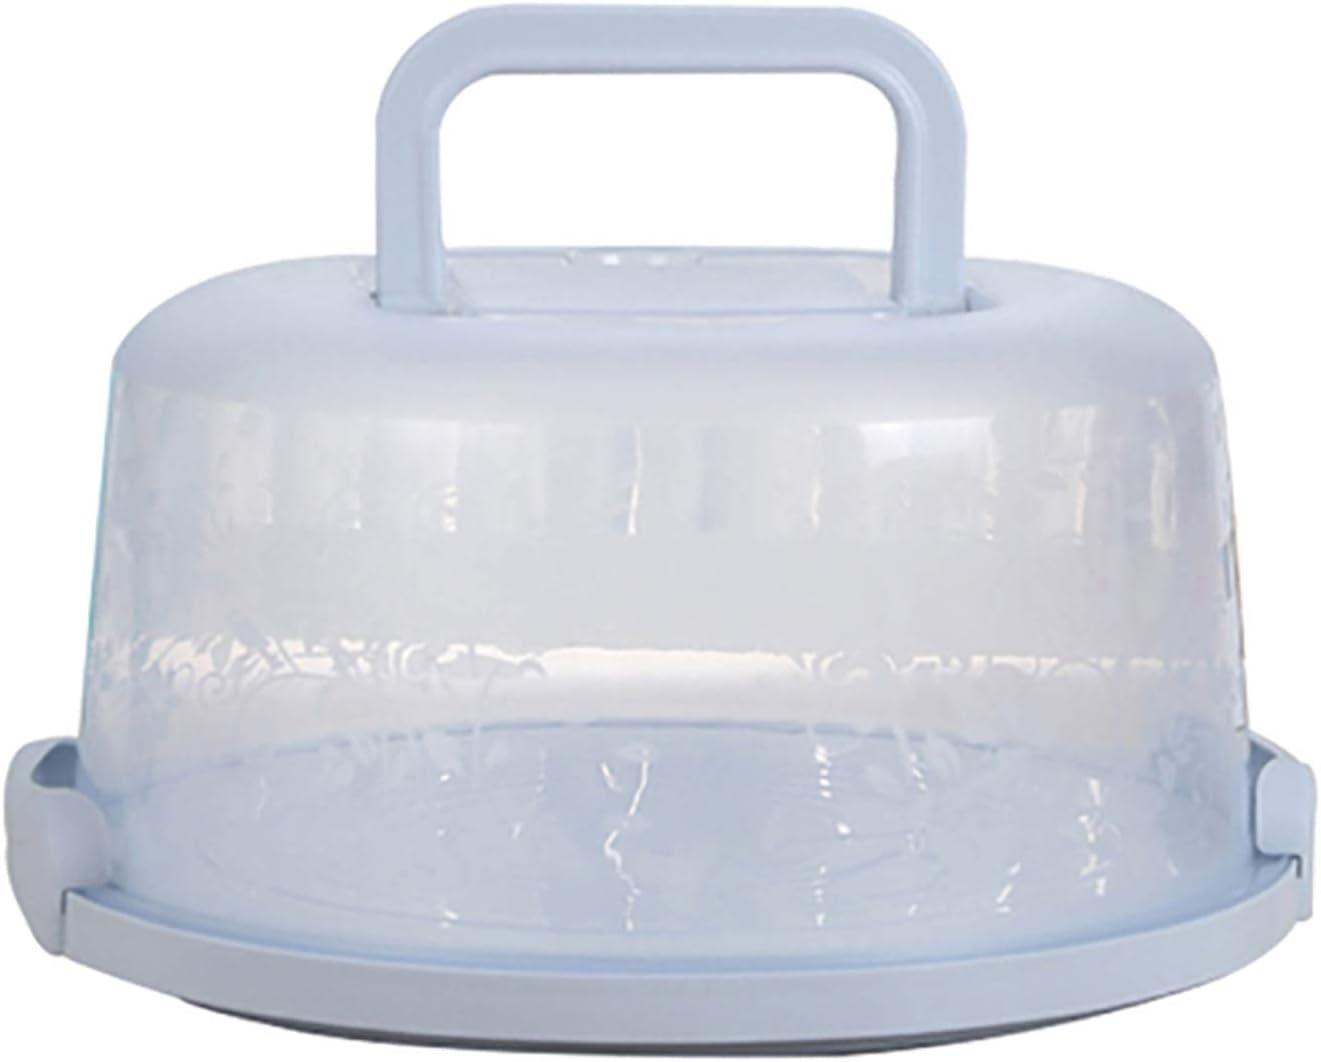 Portable Cake Box with Handle Safety Snap Button Cake Storage Box Dessert Fruit Cake Baked Food Multifunctional Transparent Storage Box (262212.5cm, Blue)